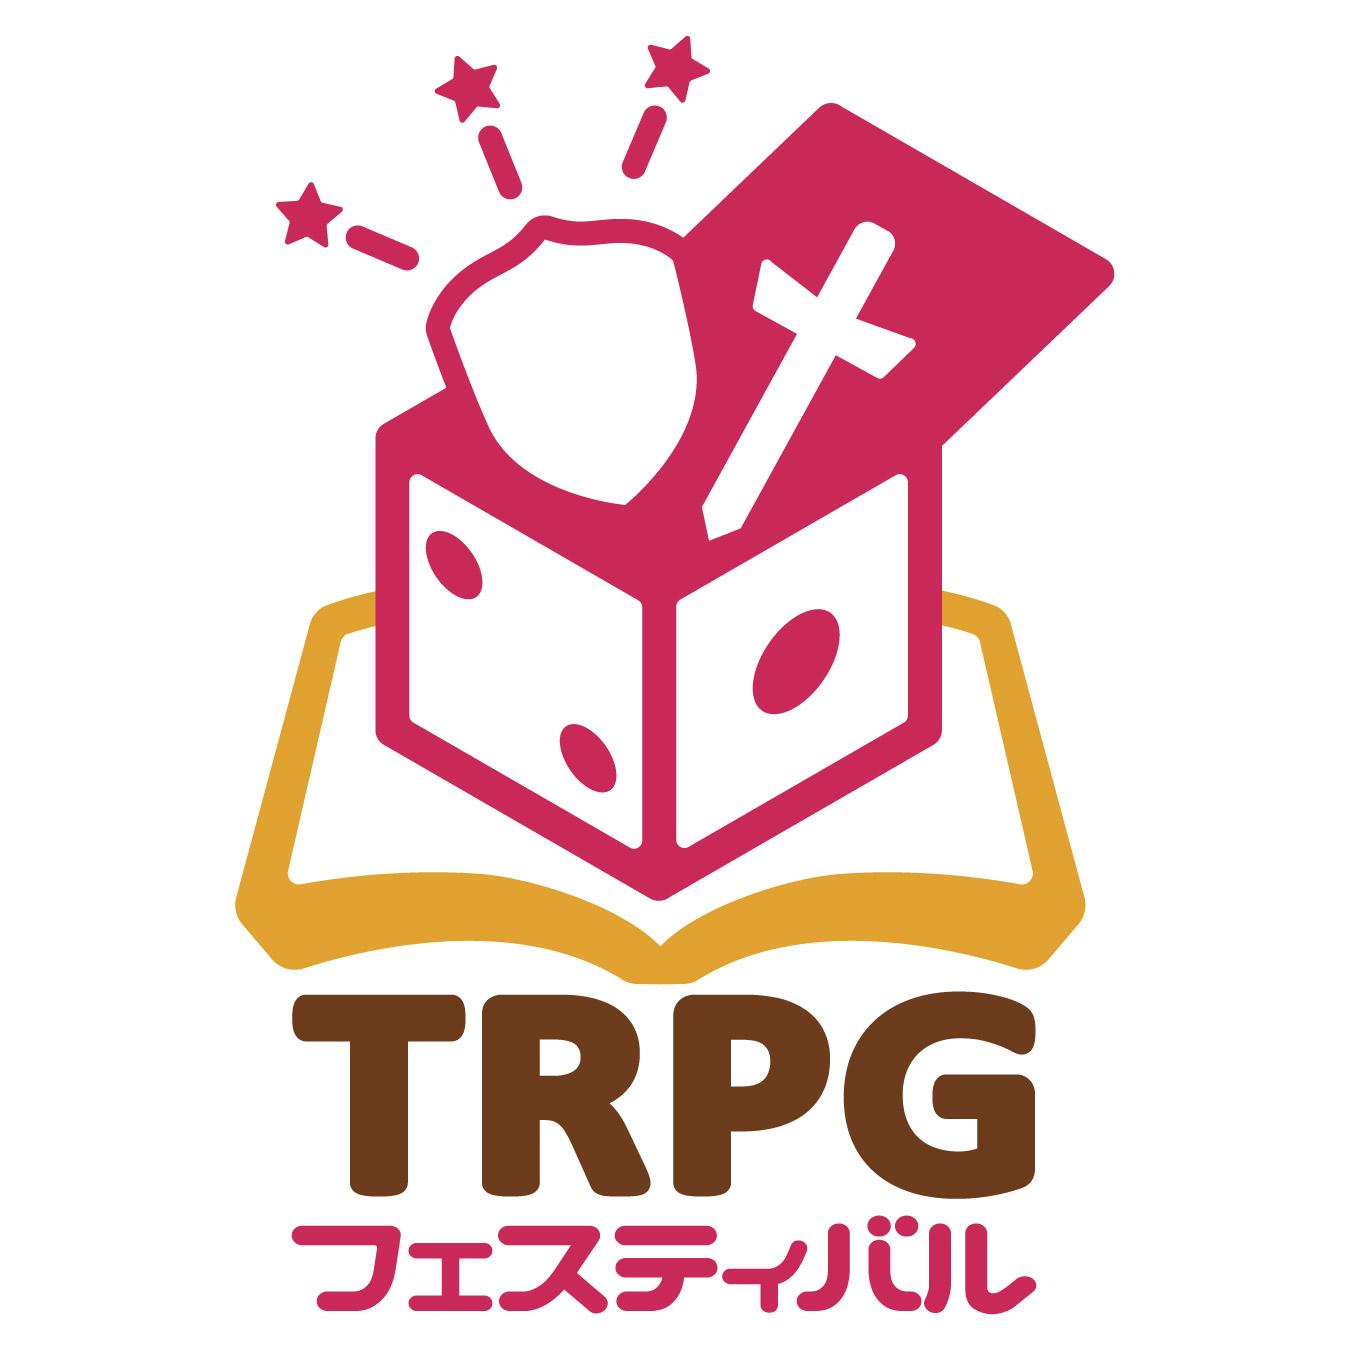 TRPGフレッシュフェス画像